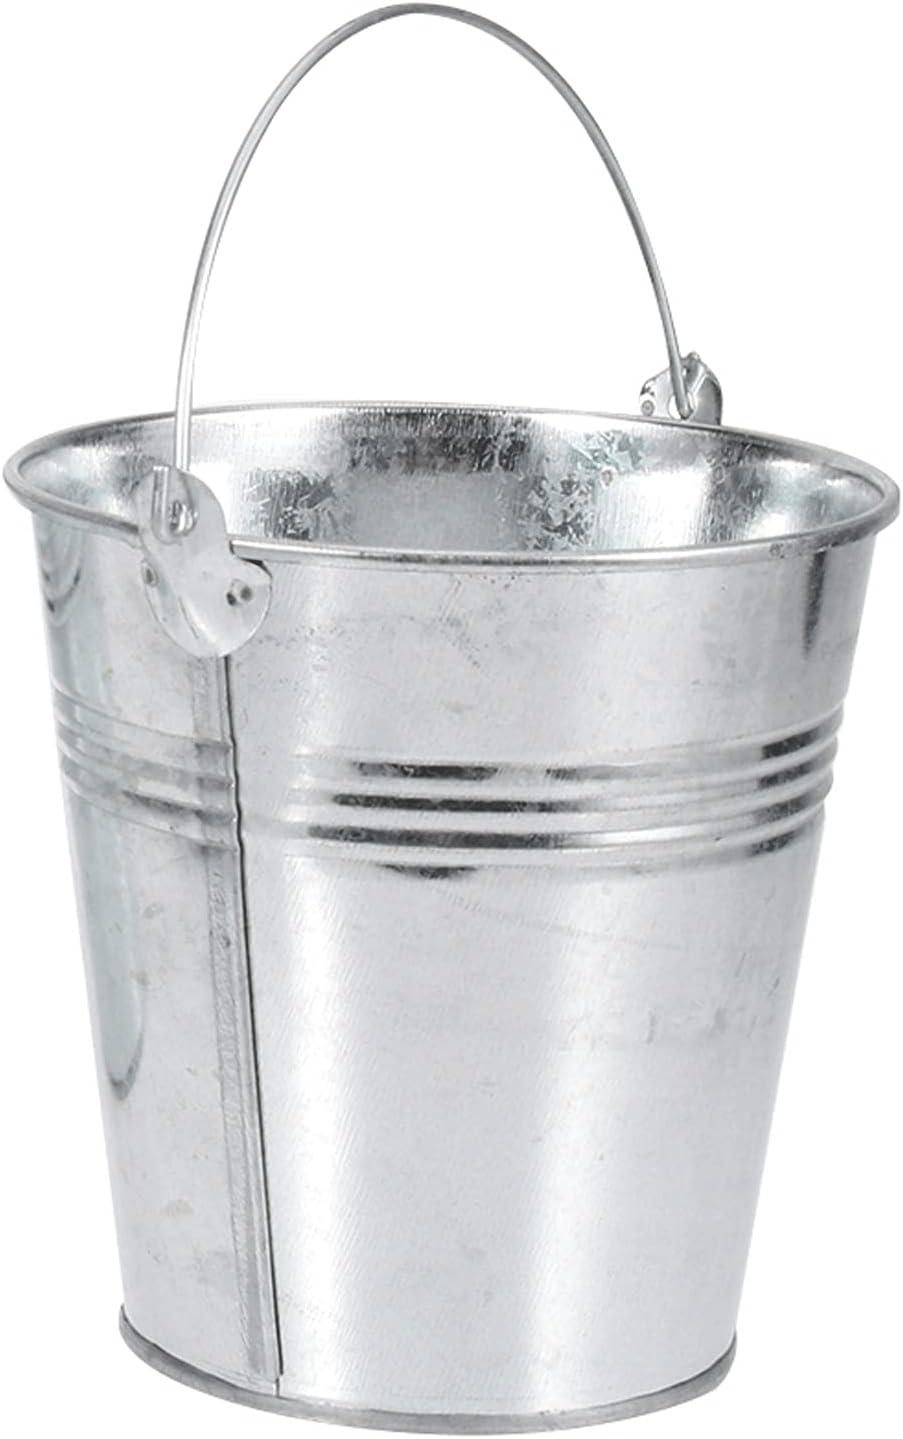 Superlatite 1pcs Ice Bucket NEW Tin Pails Metal Fries Pa Tinplate French